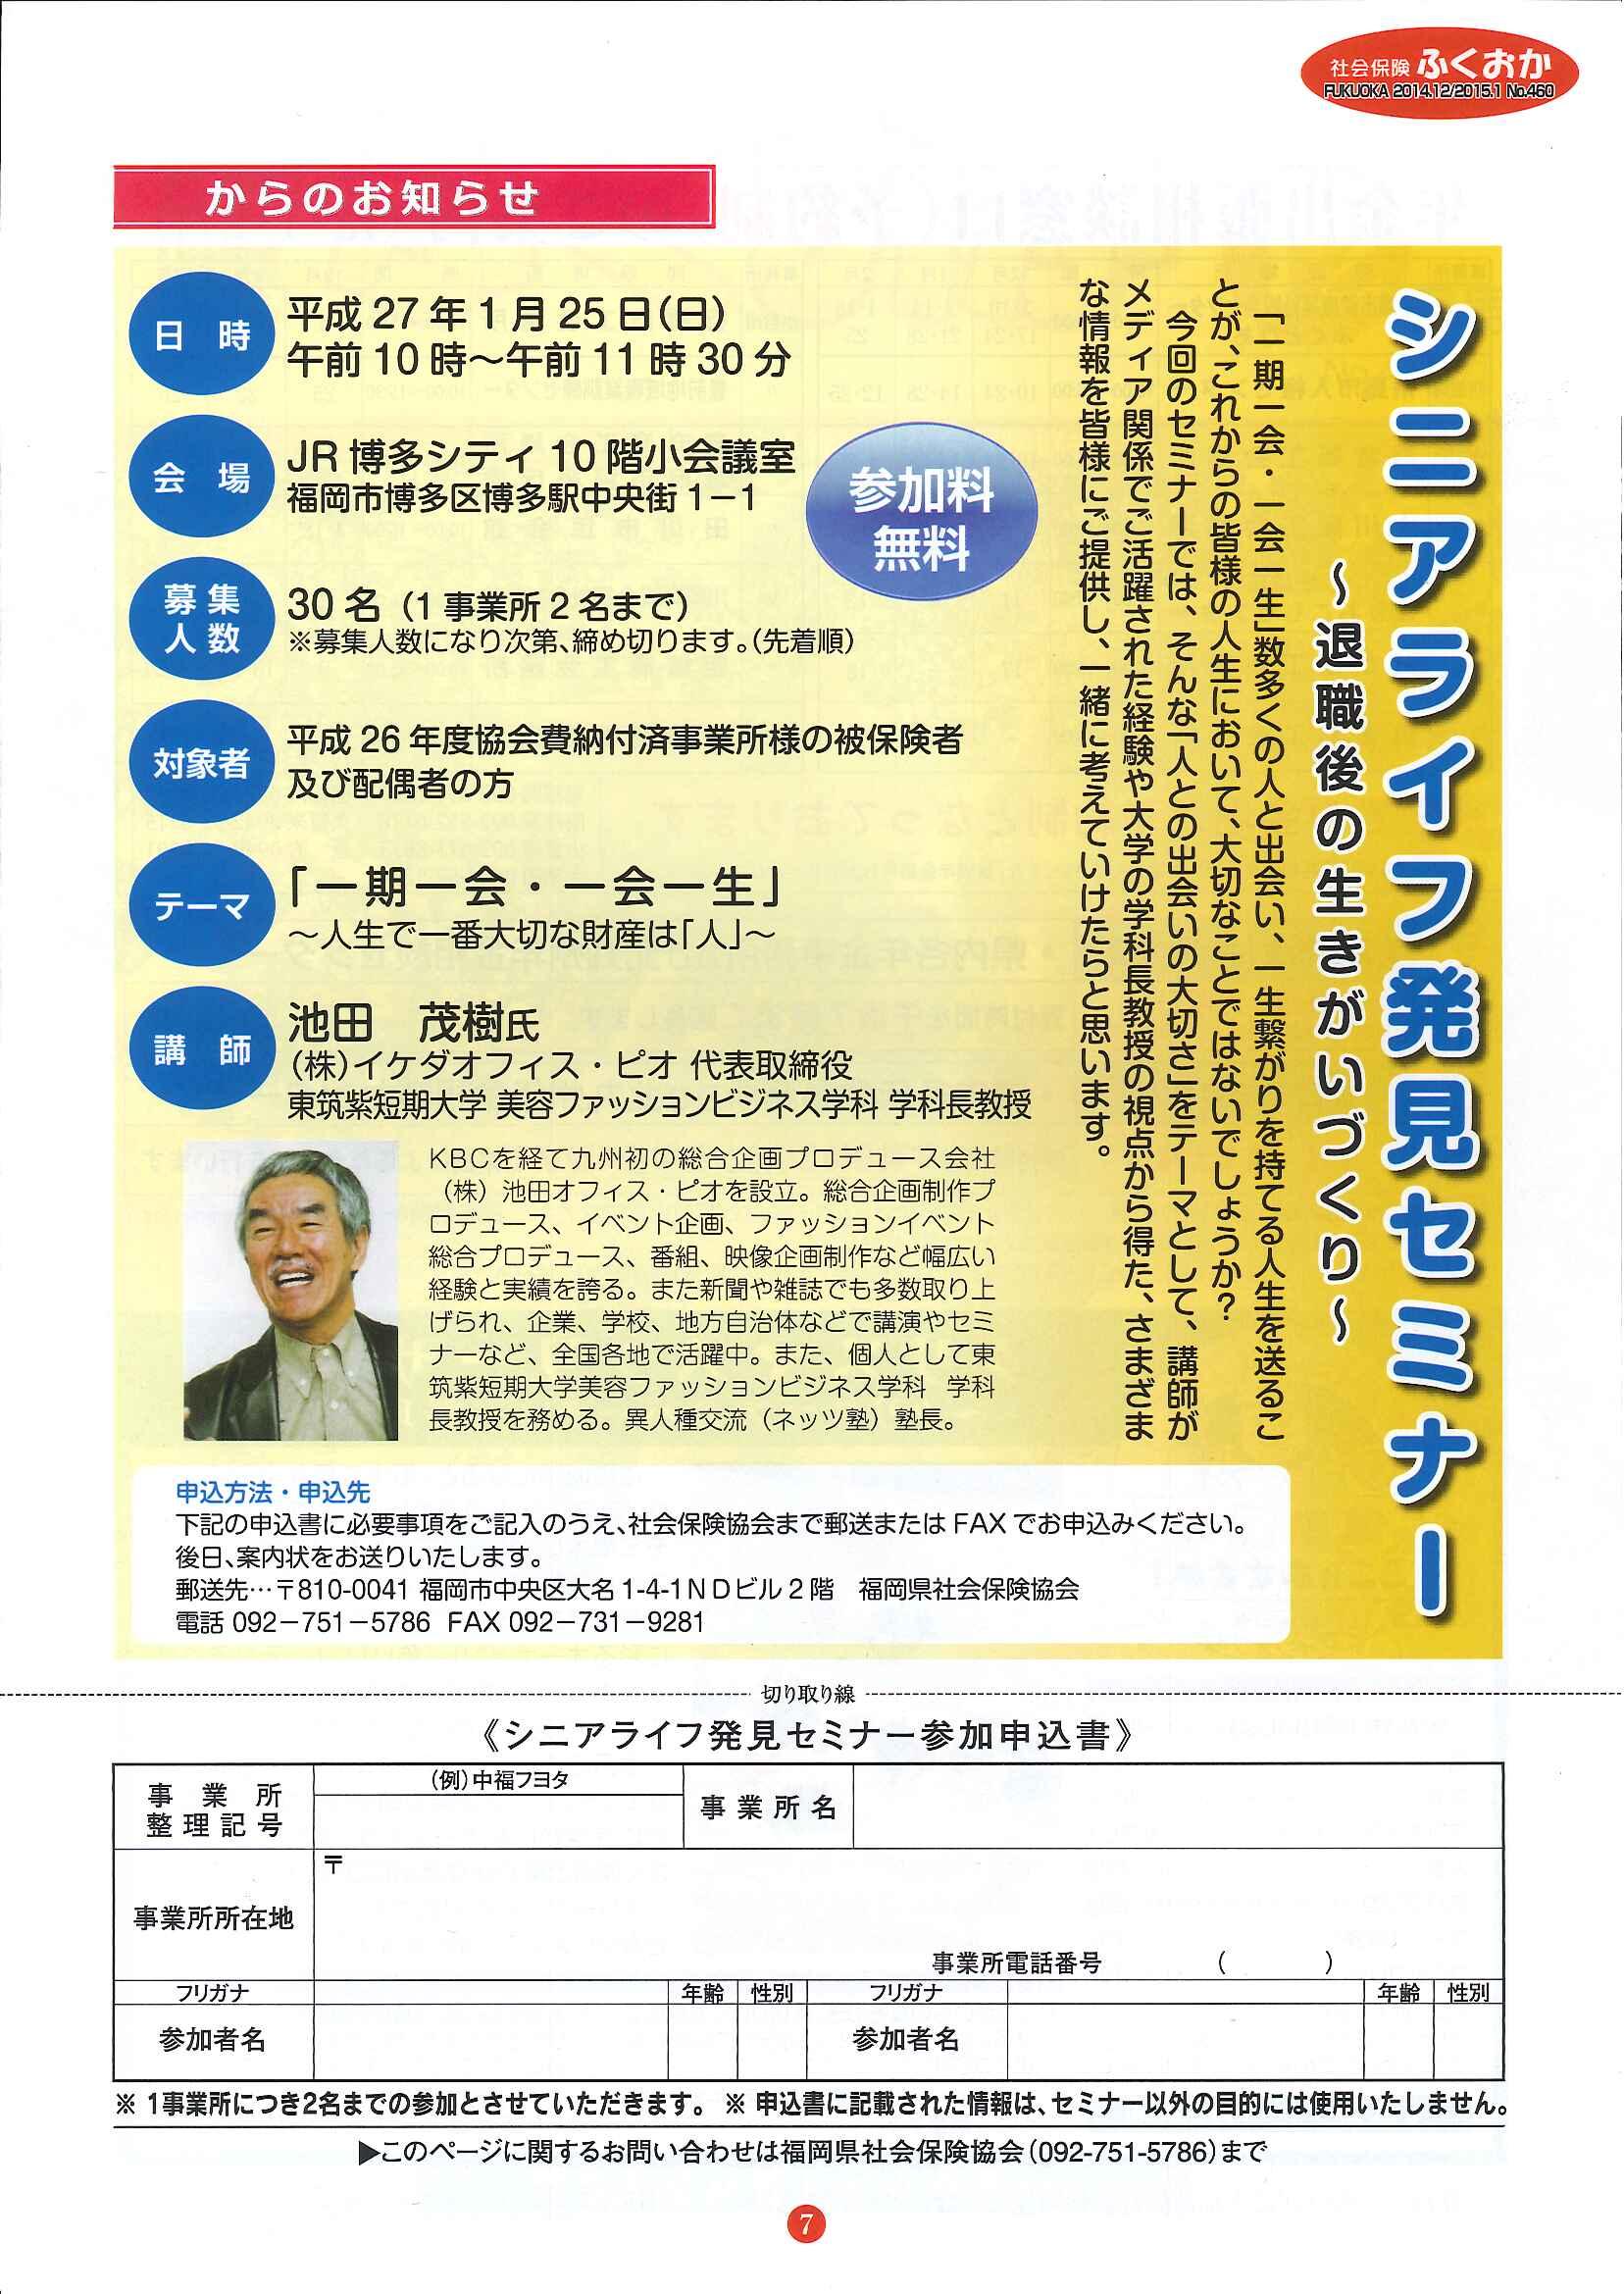 H27年1月予定/社会保険「ふくおか」/年末年始事務局休み_f0120774_127436.jpg